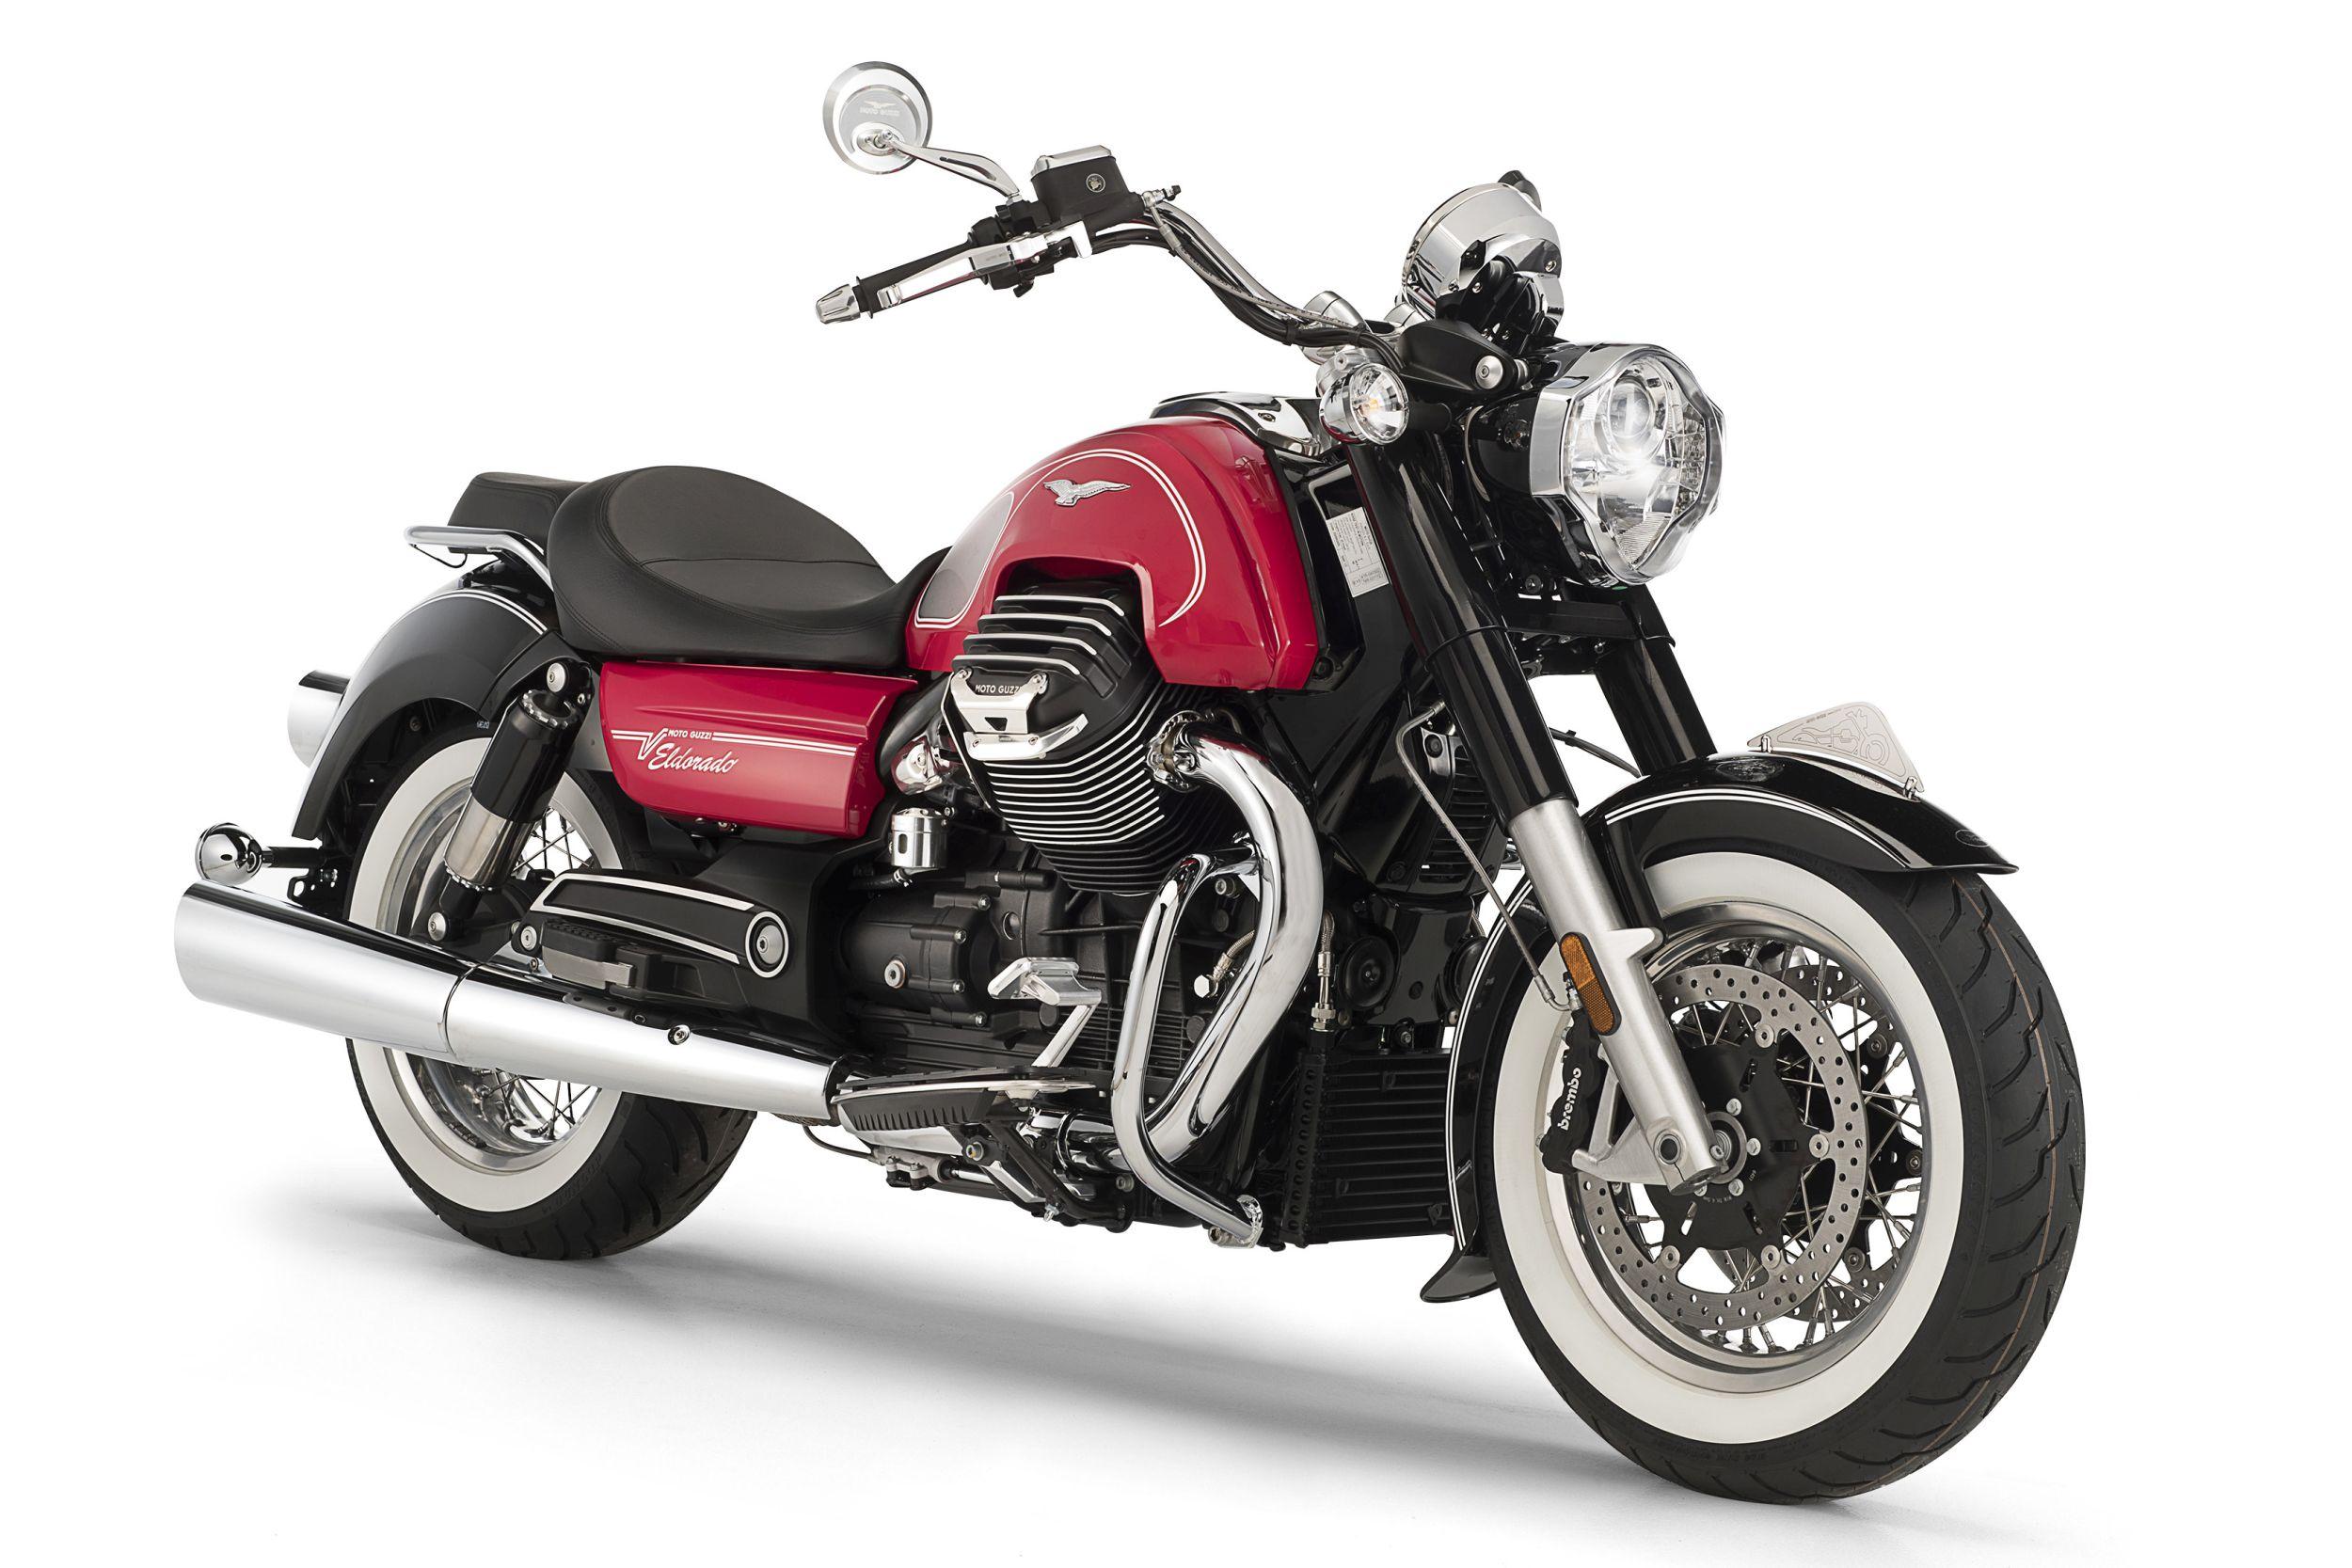 motorrad occasion moto guzzi california 1400 eldorado kaufen. Black Bedroom Furniture Sets. Home Design Ideas